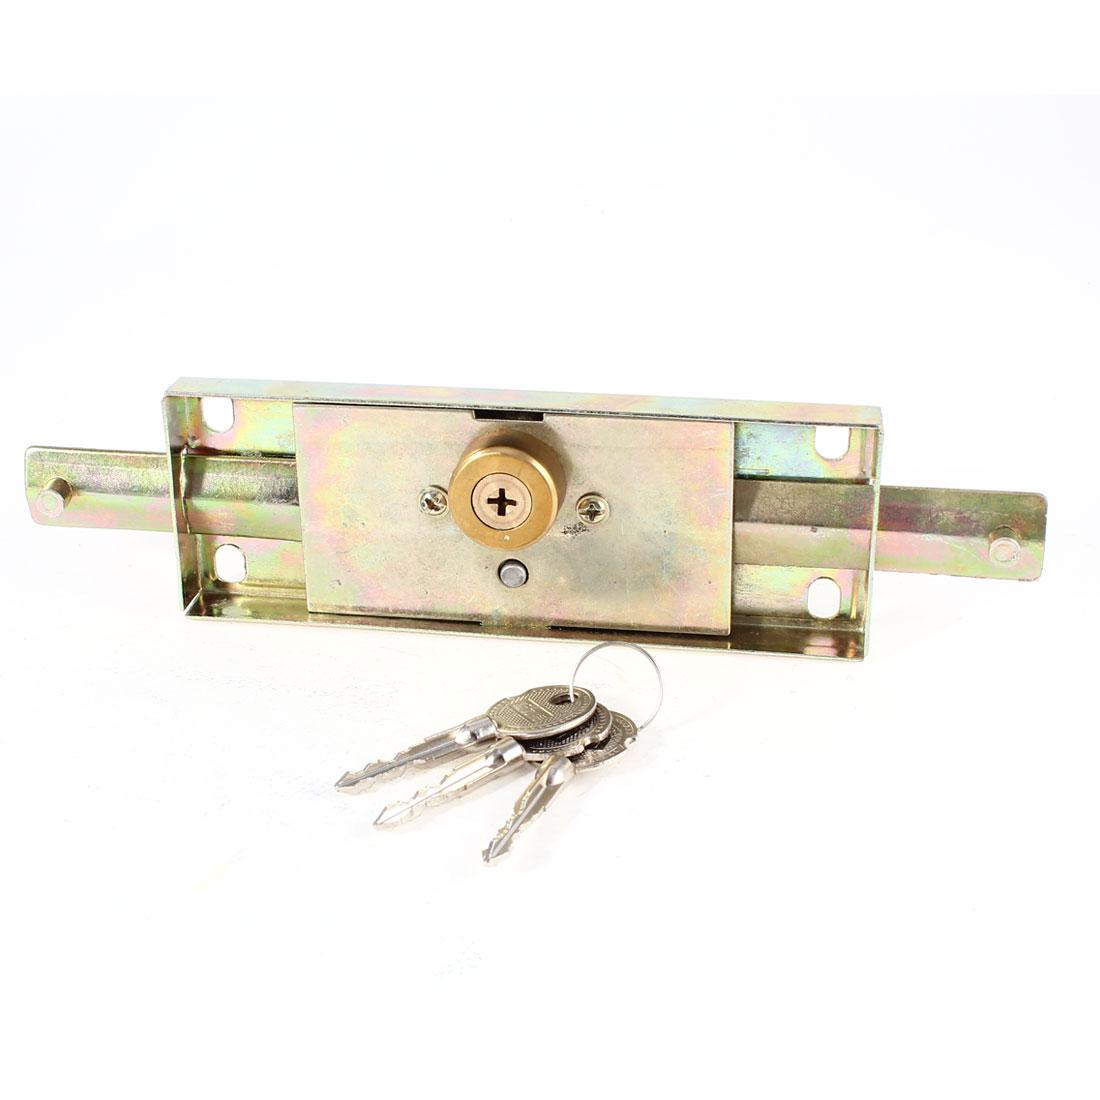 Warehouse Garage Security Locking Locker Rolling Gate Door Lock w 3 Keys